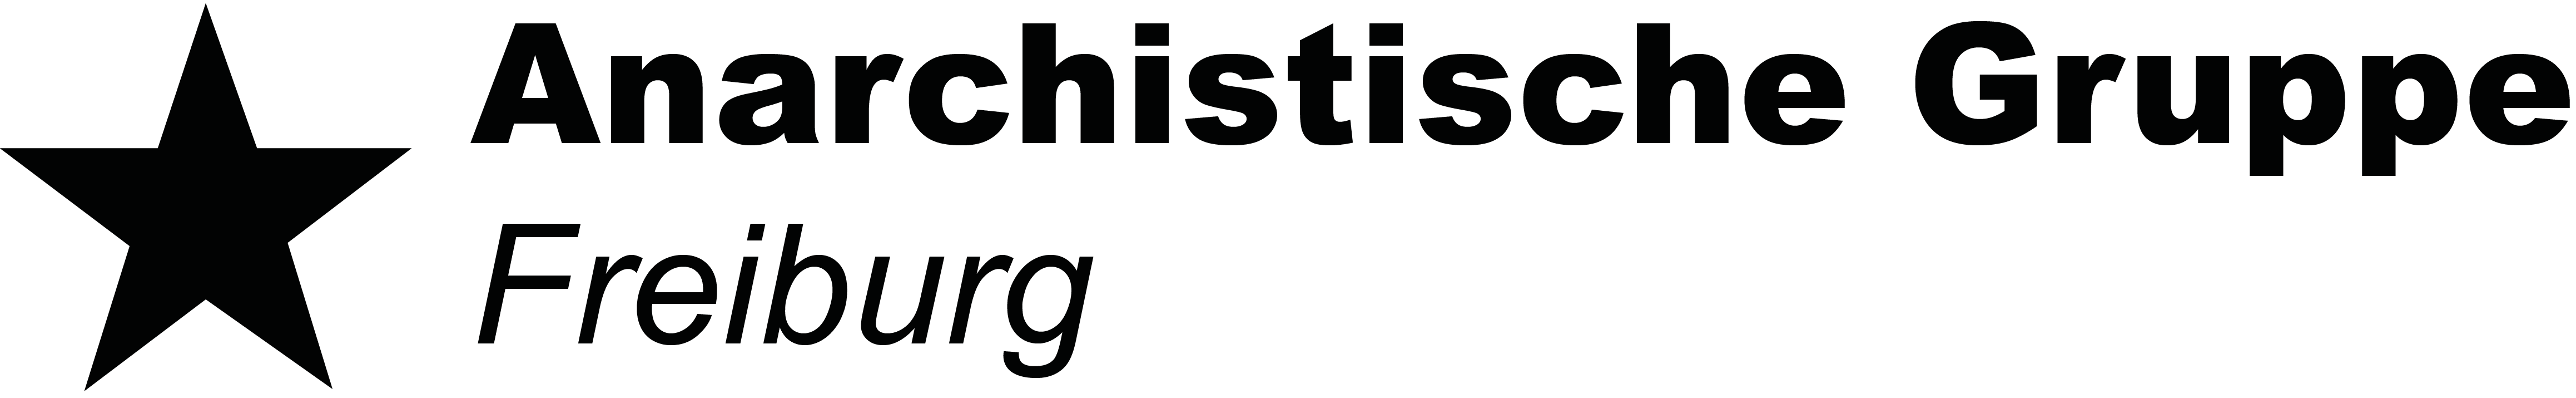 ag logo-transbg